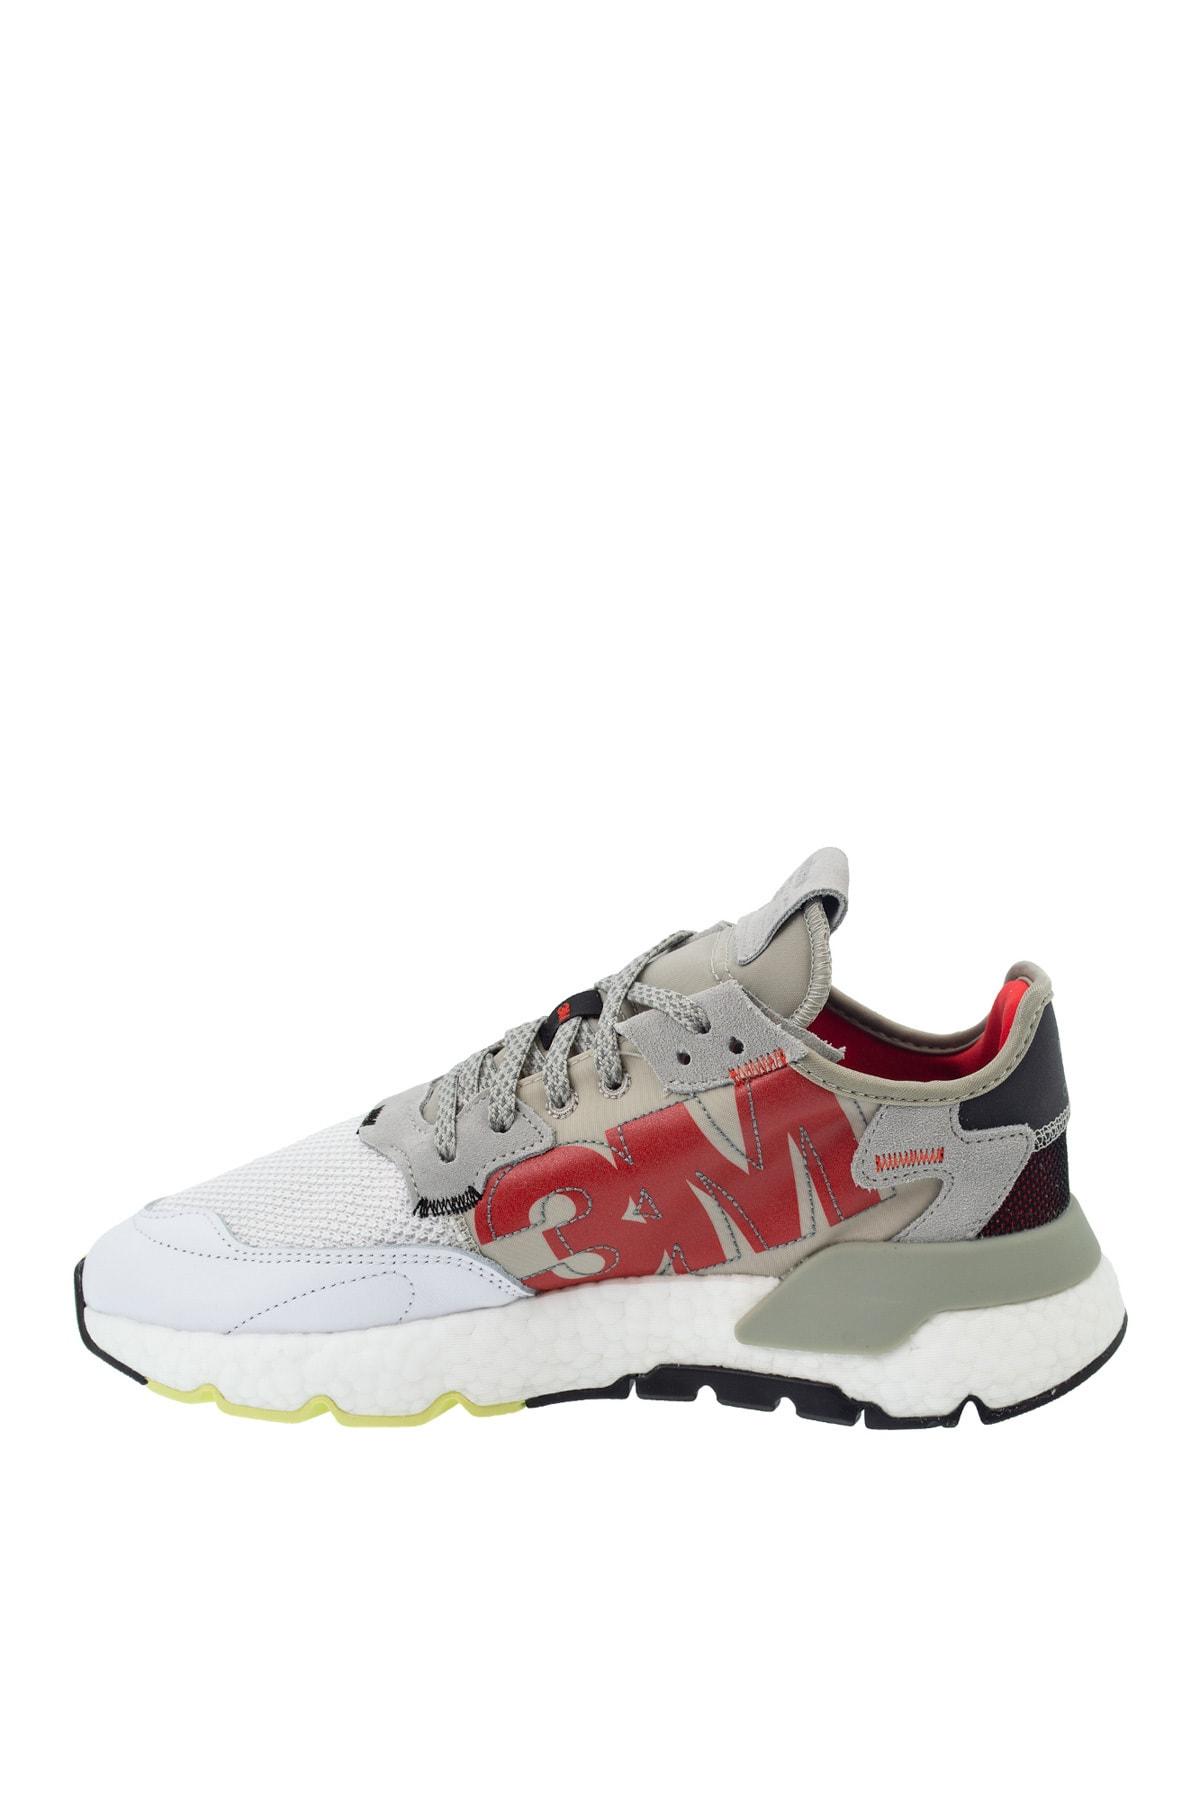 adidas Nite Jogger Erkek Gri Spor Ayakkabı (EF5409) 2